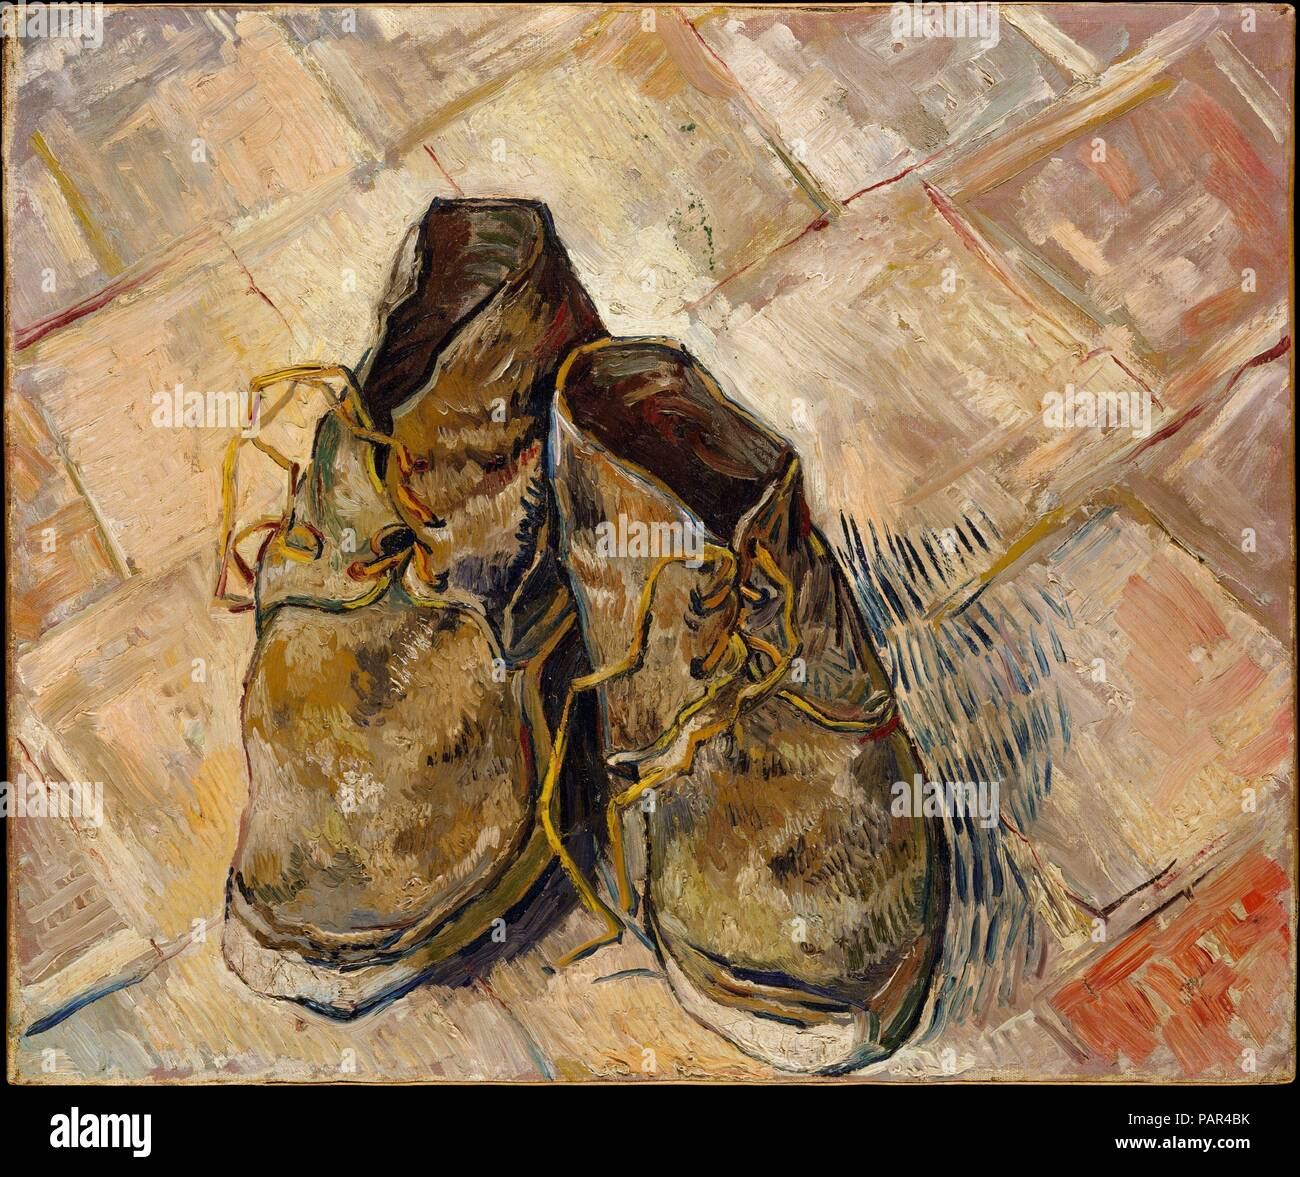 Vincent Van Gogh 1853 1890 Dutch The Netherlands Stock Photos ...